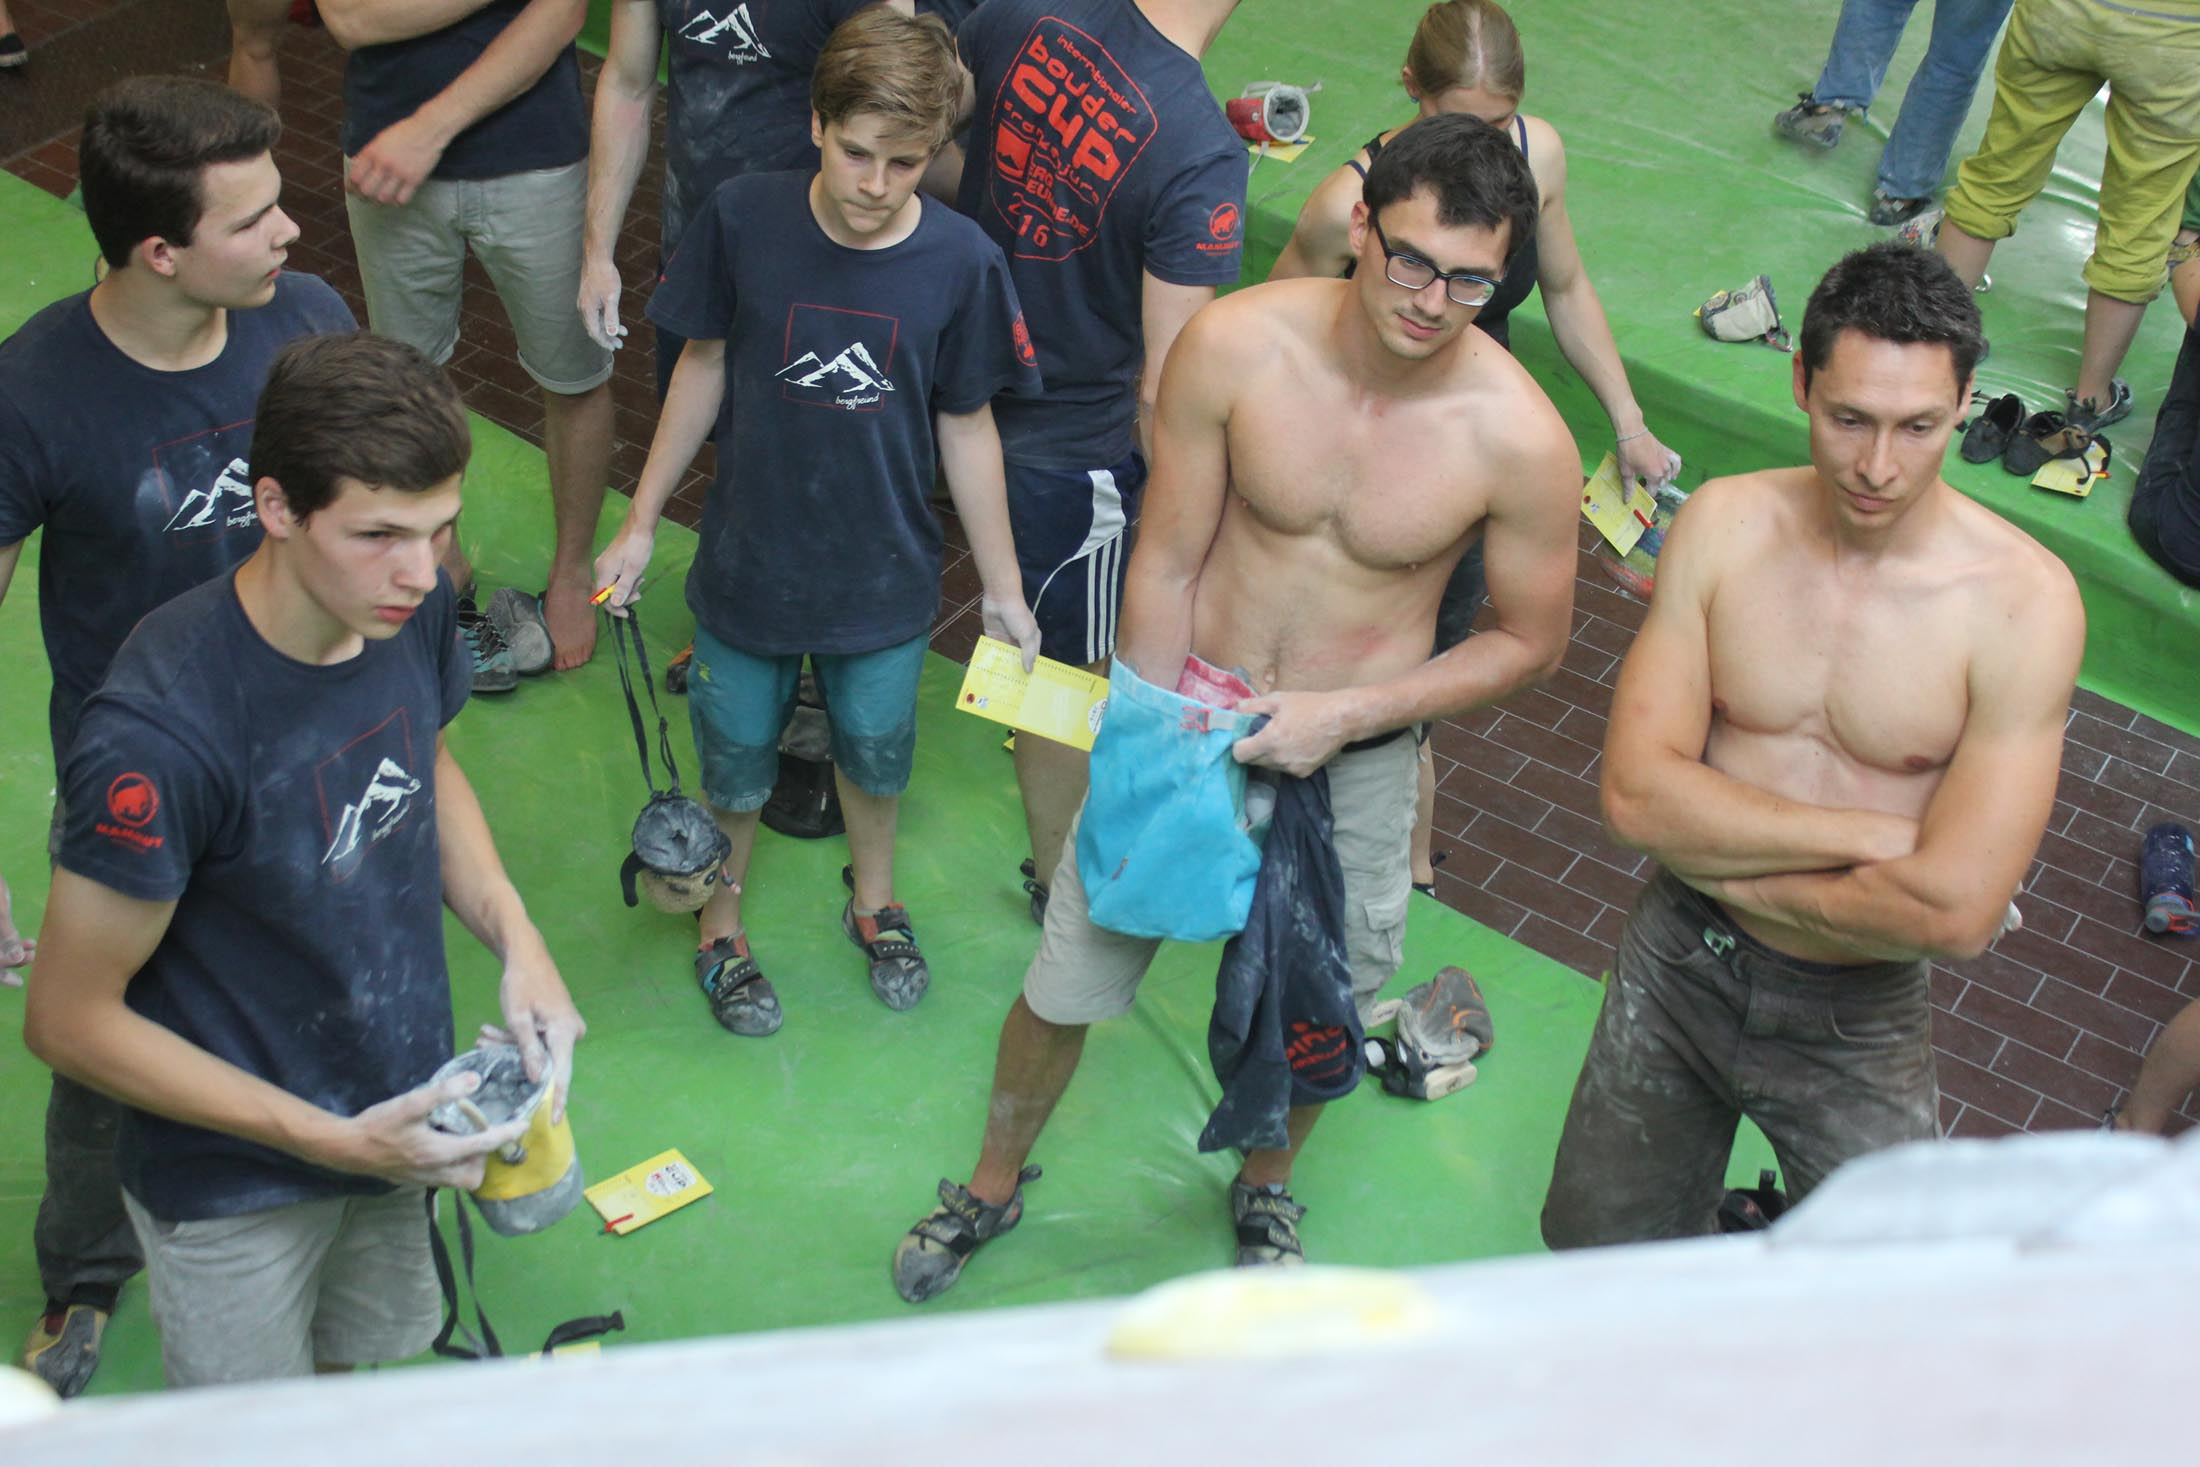 Quali, internationaler bouldercup Frankenjura 2016, BLOCKHELDEN Erlangen, Mammut, Bergfreunde.de, Boulderwettkampf07092016281